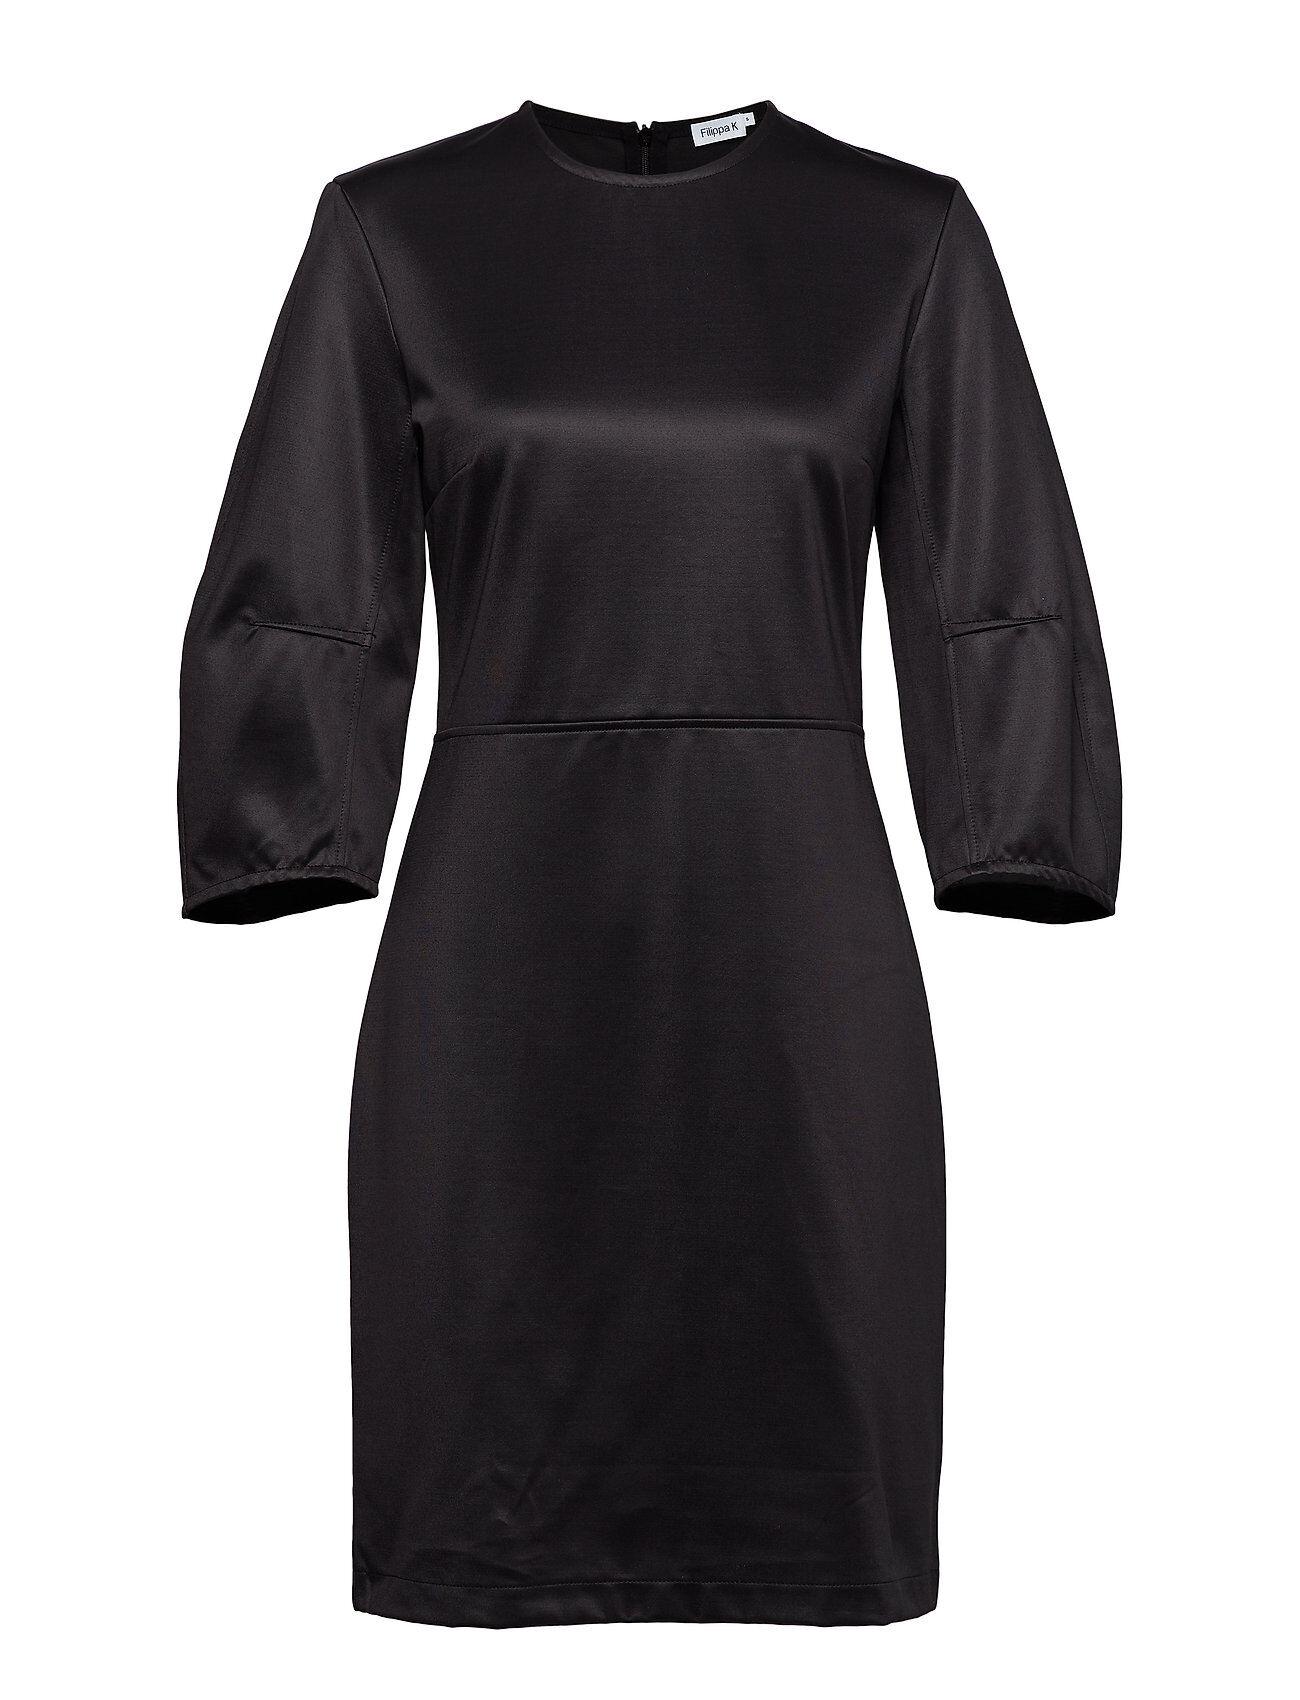 Filippa K Sculptural Sleeve Dress